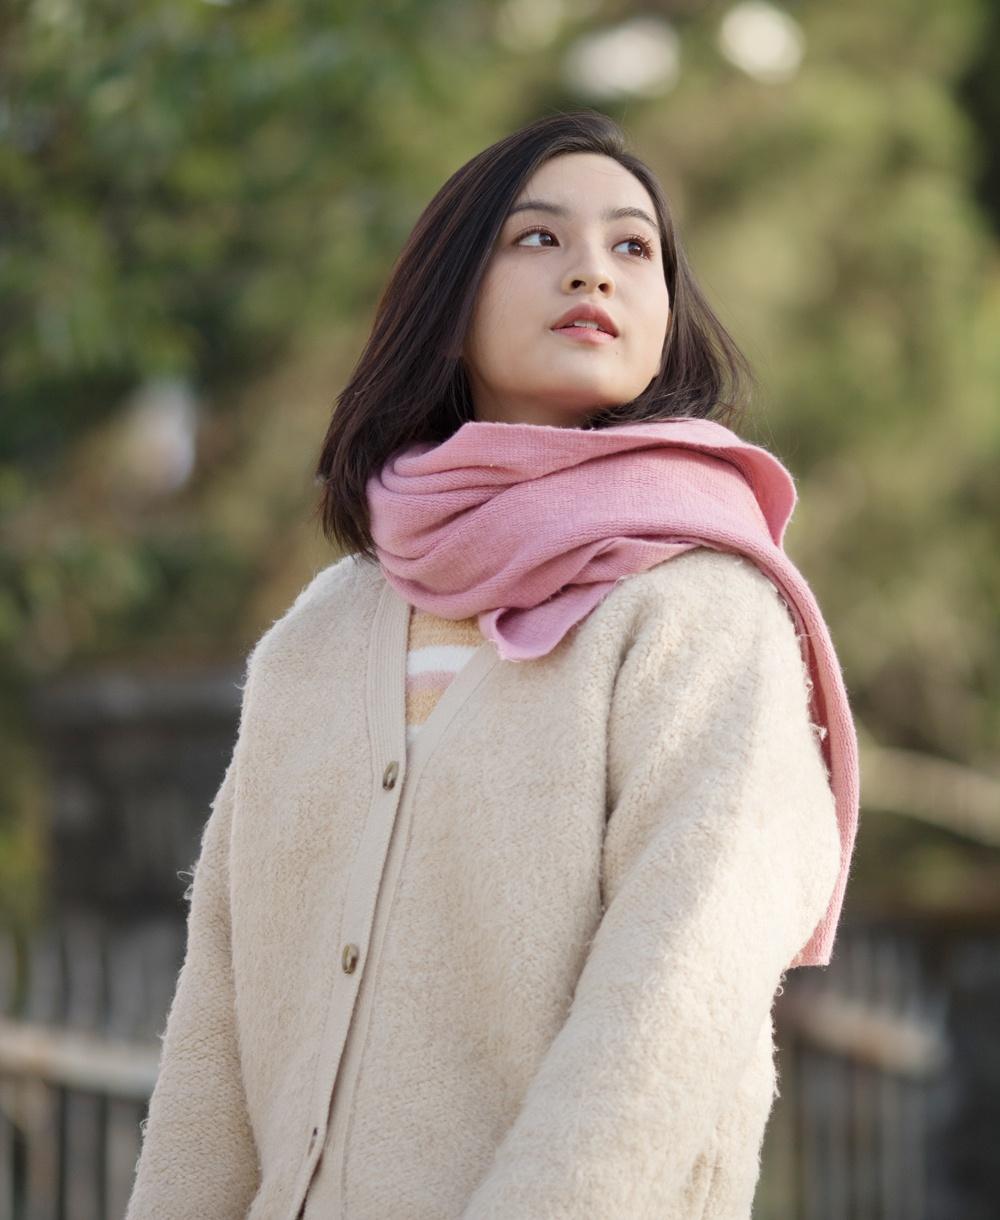 Nhan sac hot girl 'Mat biec' trong lan dau dong MV hinh anh 3 thao_tam3.jpg